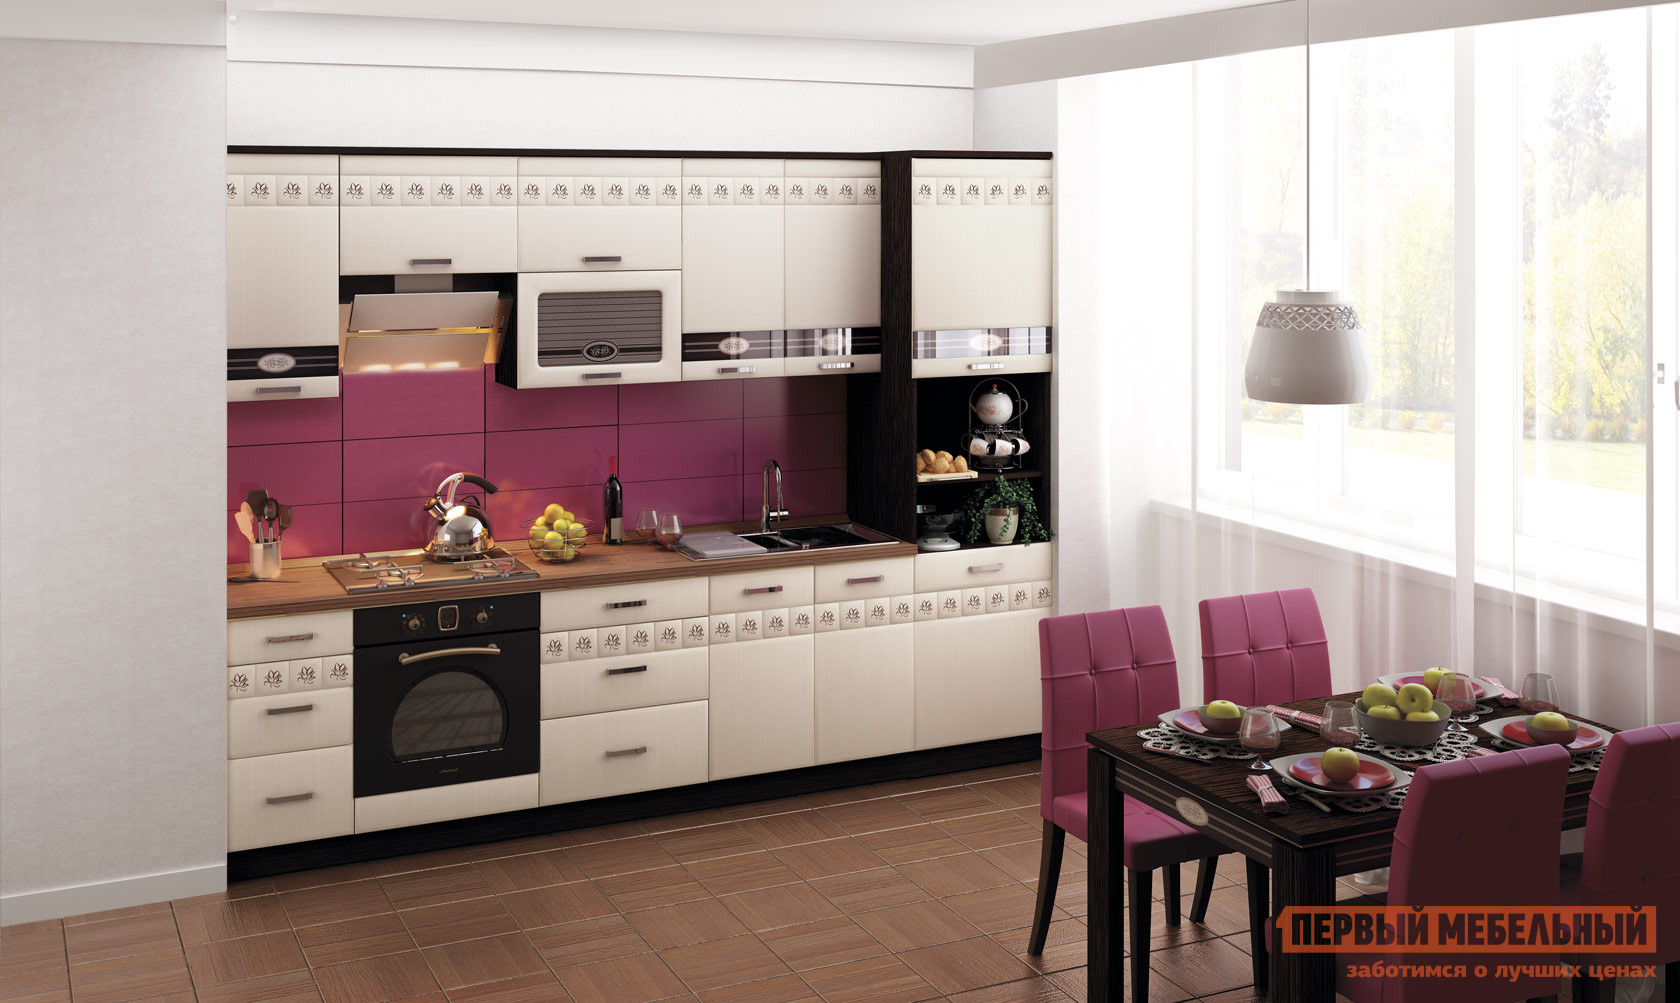 Кухонный гарнитур Витра Аврора 300-3 кухонный гарнитур витра глория 3 к1